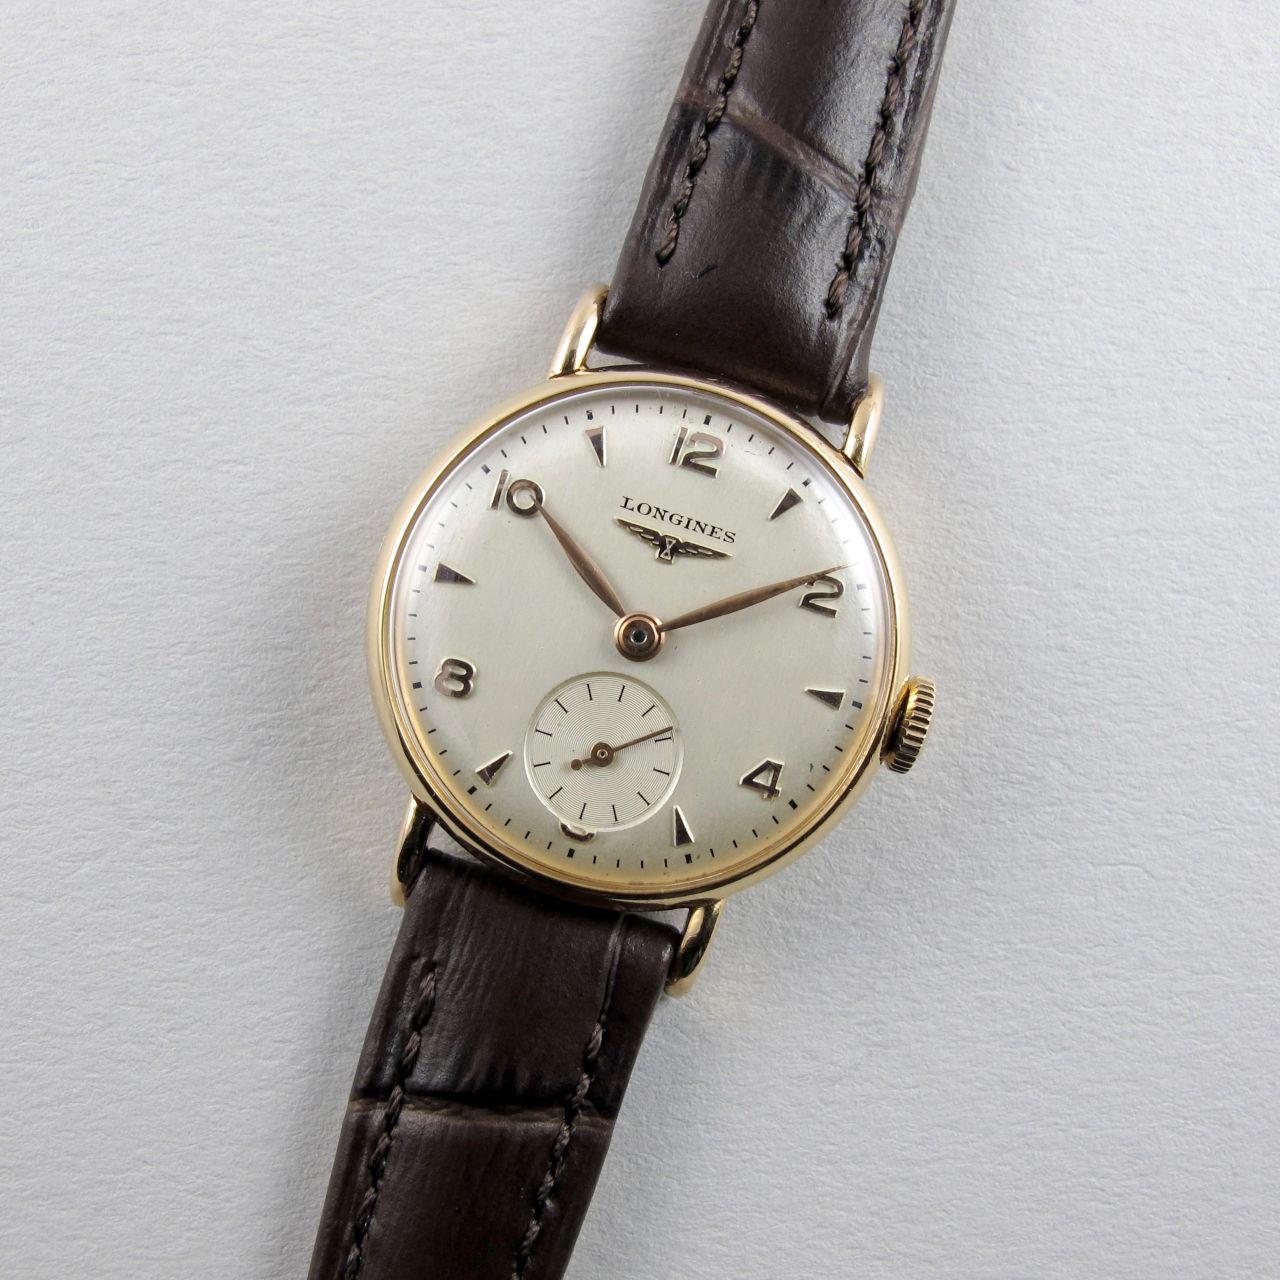 Longines Ref. 4984 -10 gold vintage wristwatch, circa 1951